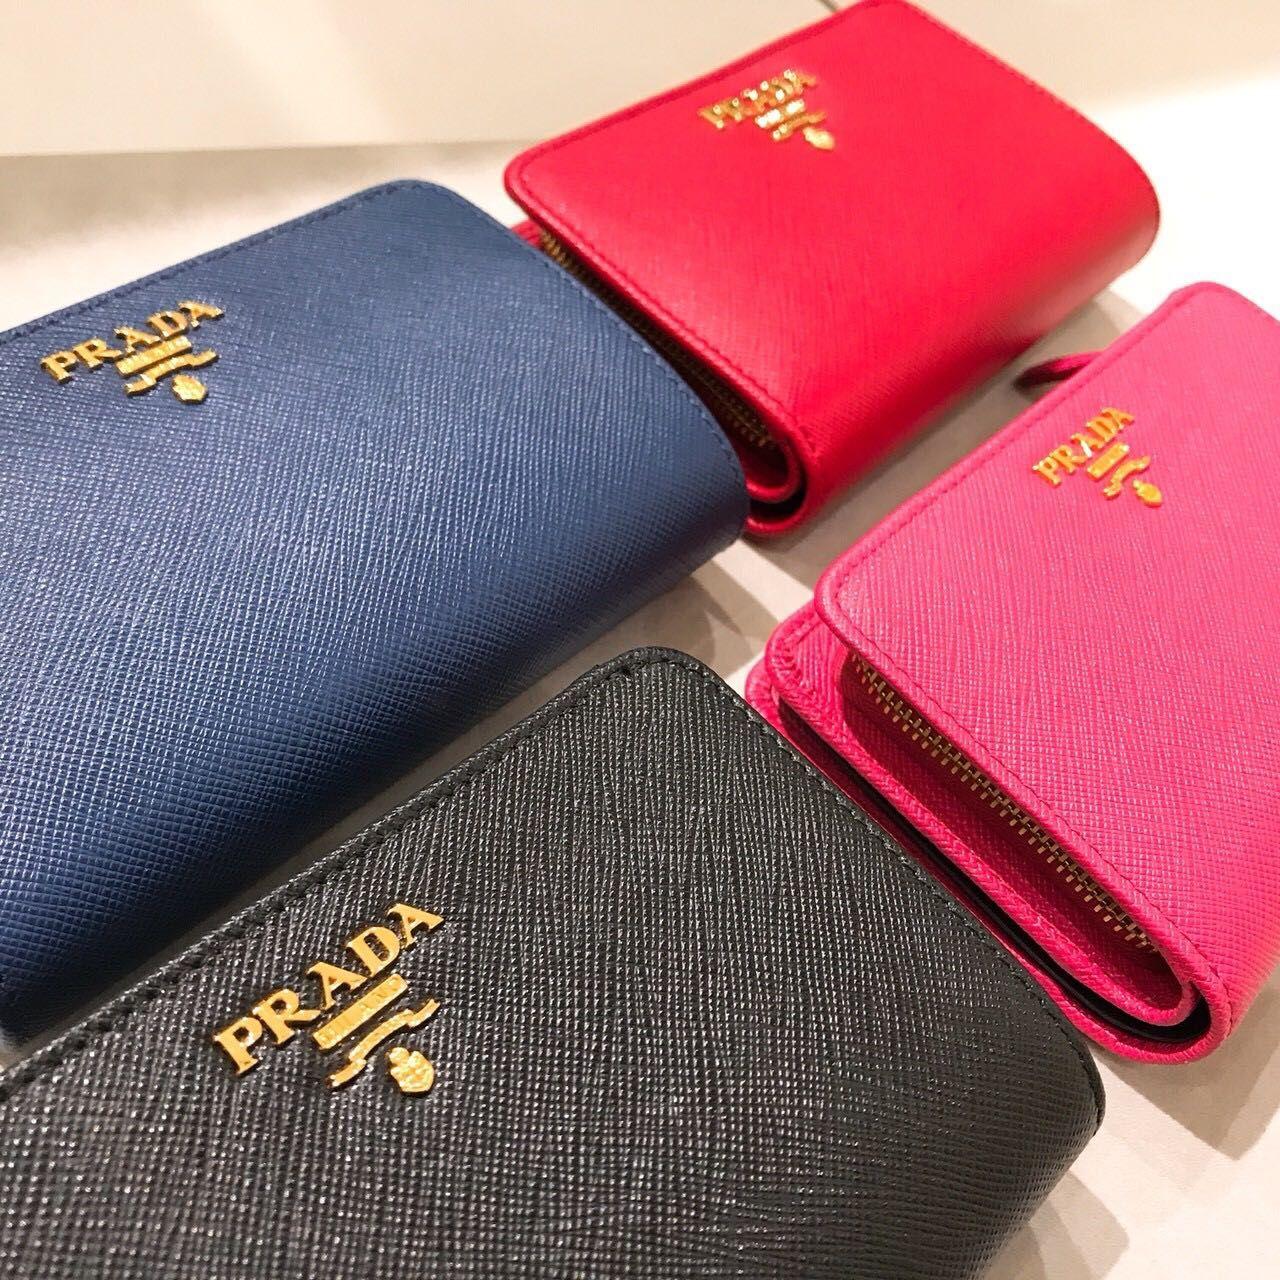 buy popular 12162 562c9 PRADA コイン重視派には!?   東京八王子店   フィットハウス ...